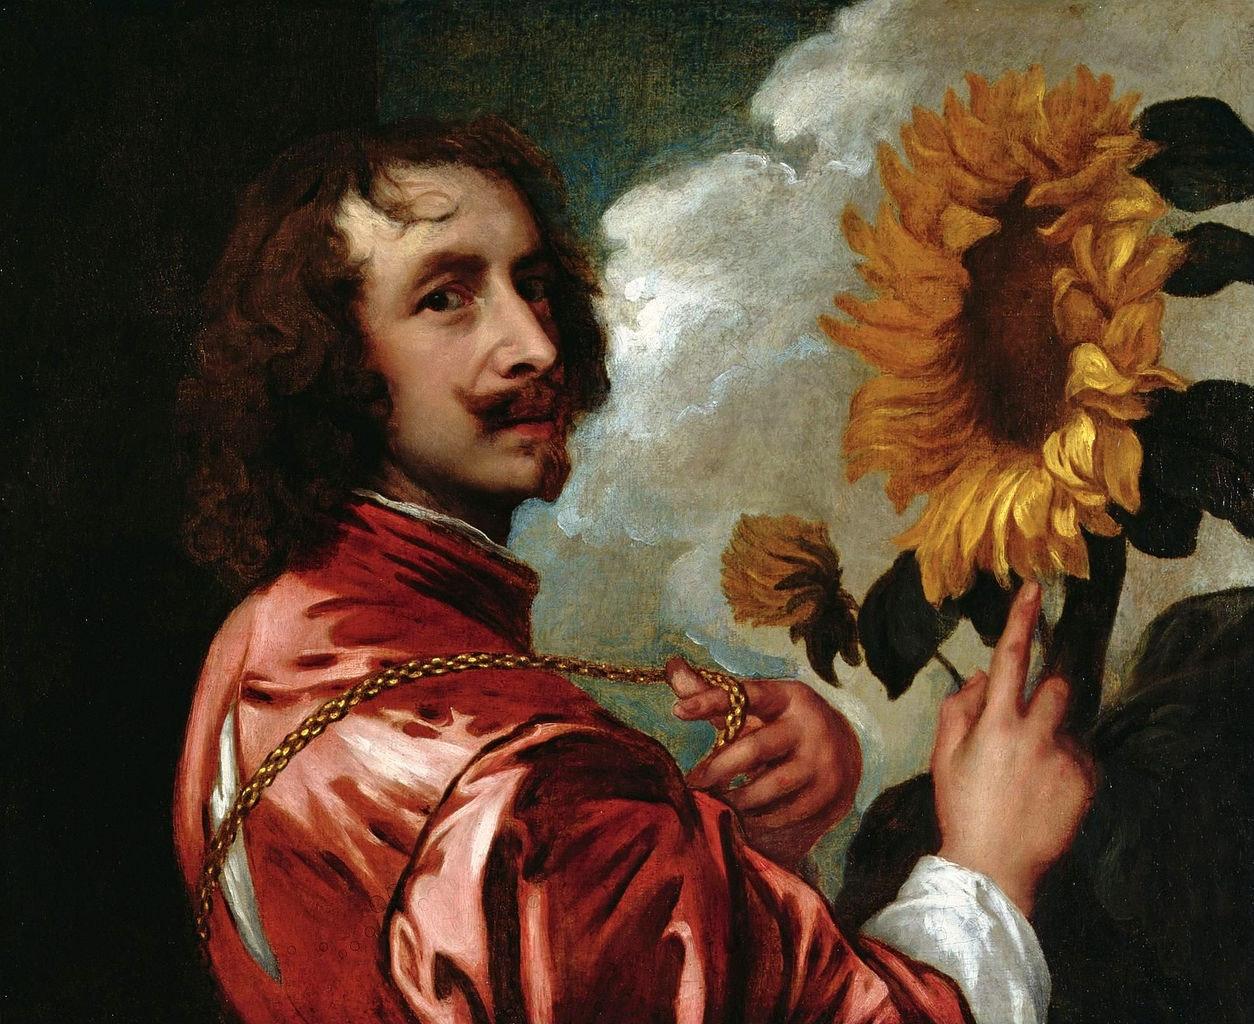 Mostra di Van Dyck alla Galleria Sabauda